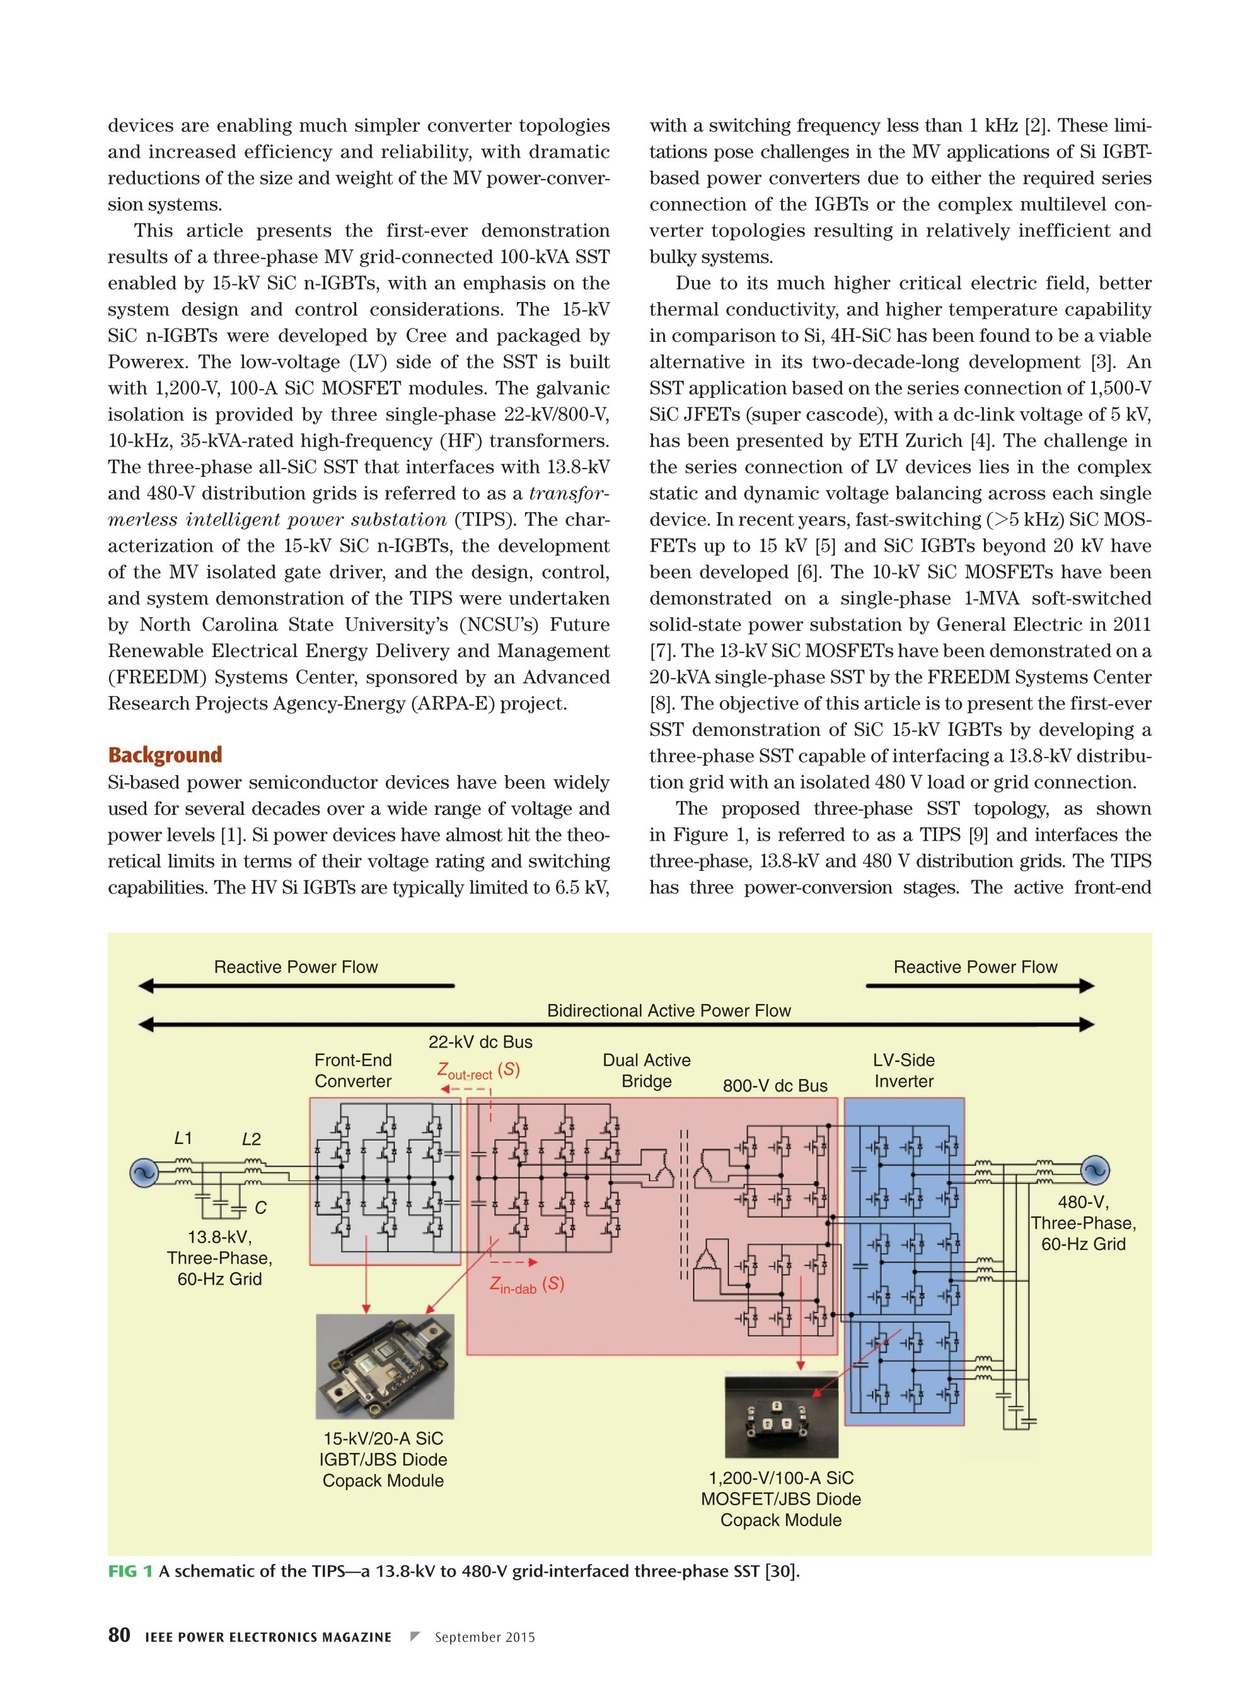 IEEE Power Electronics Magazine Compendium - March 2018